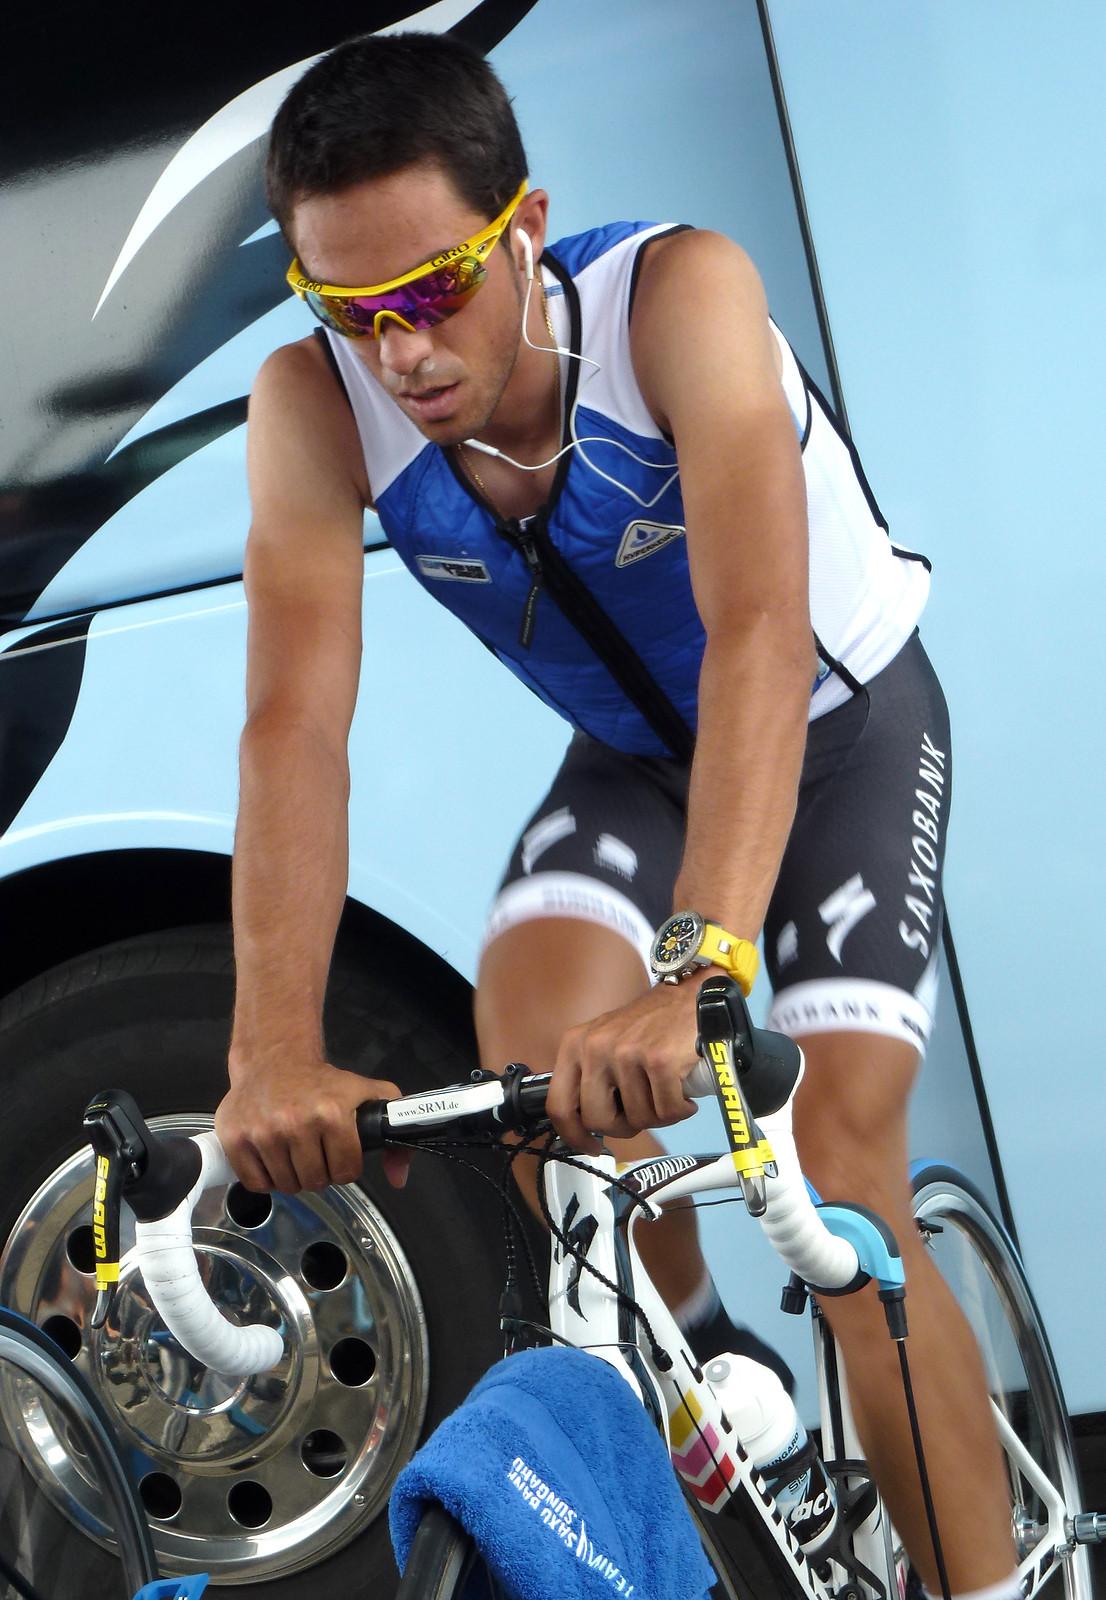 Alberto Contador Tour de France 2011 - techniche-intl - Motocross Pictures - Vital MX